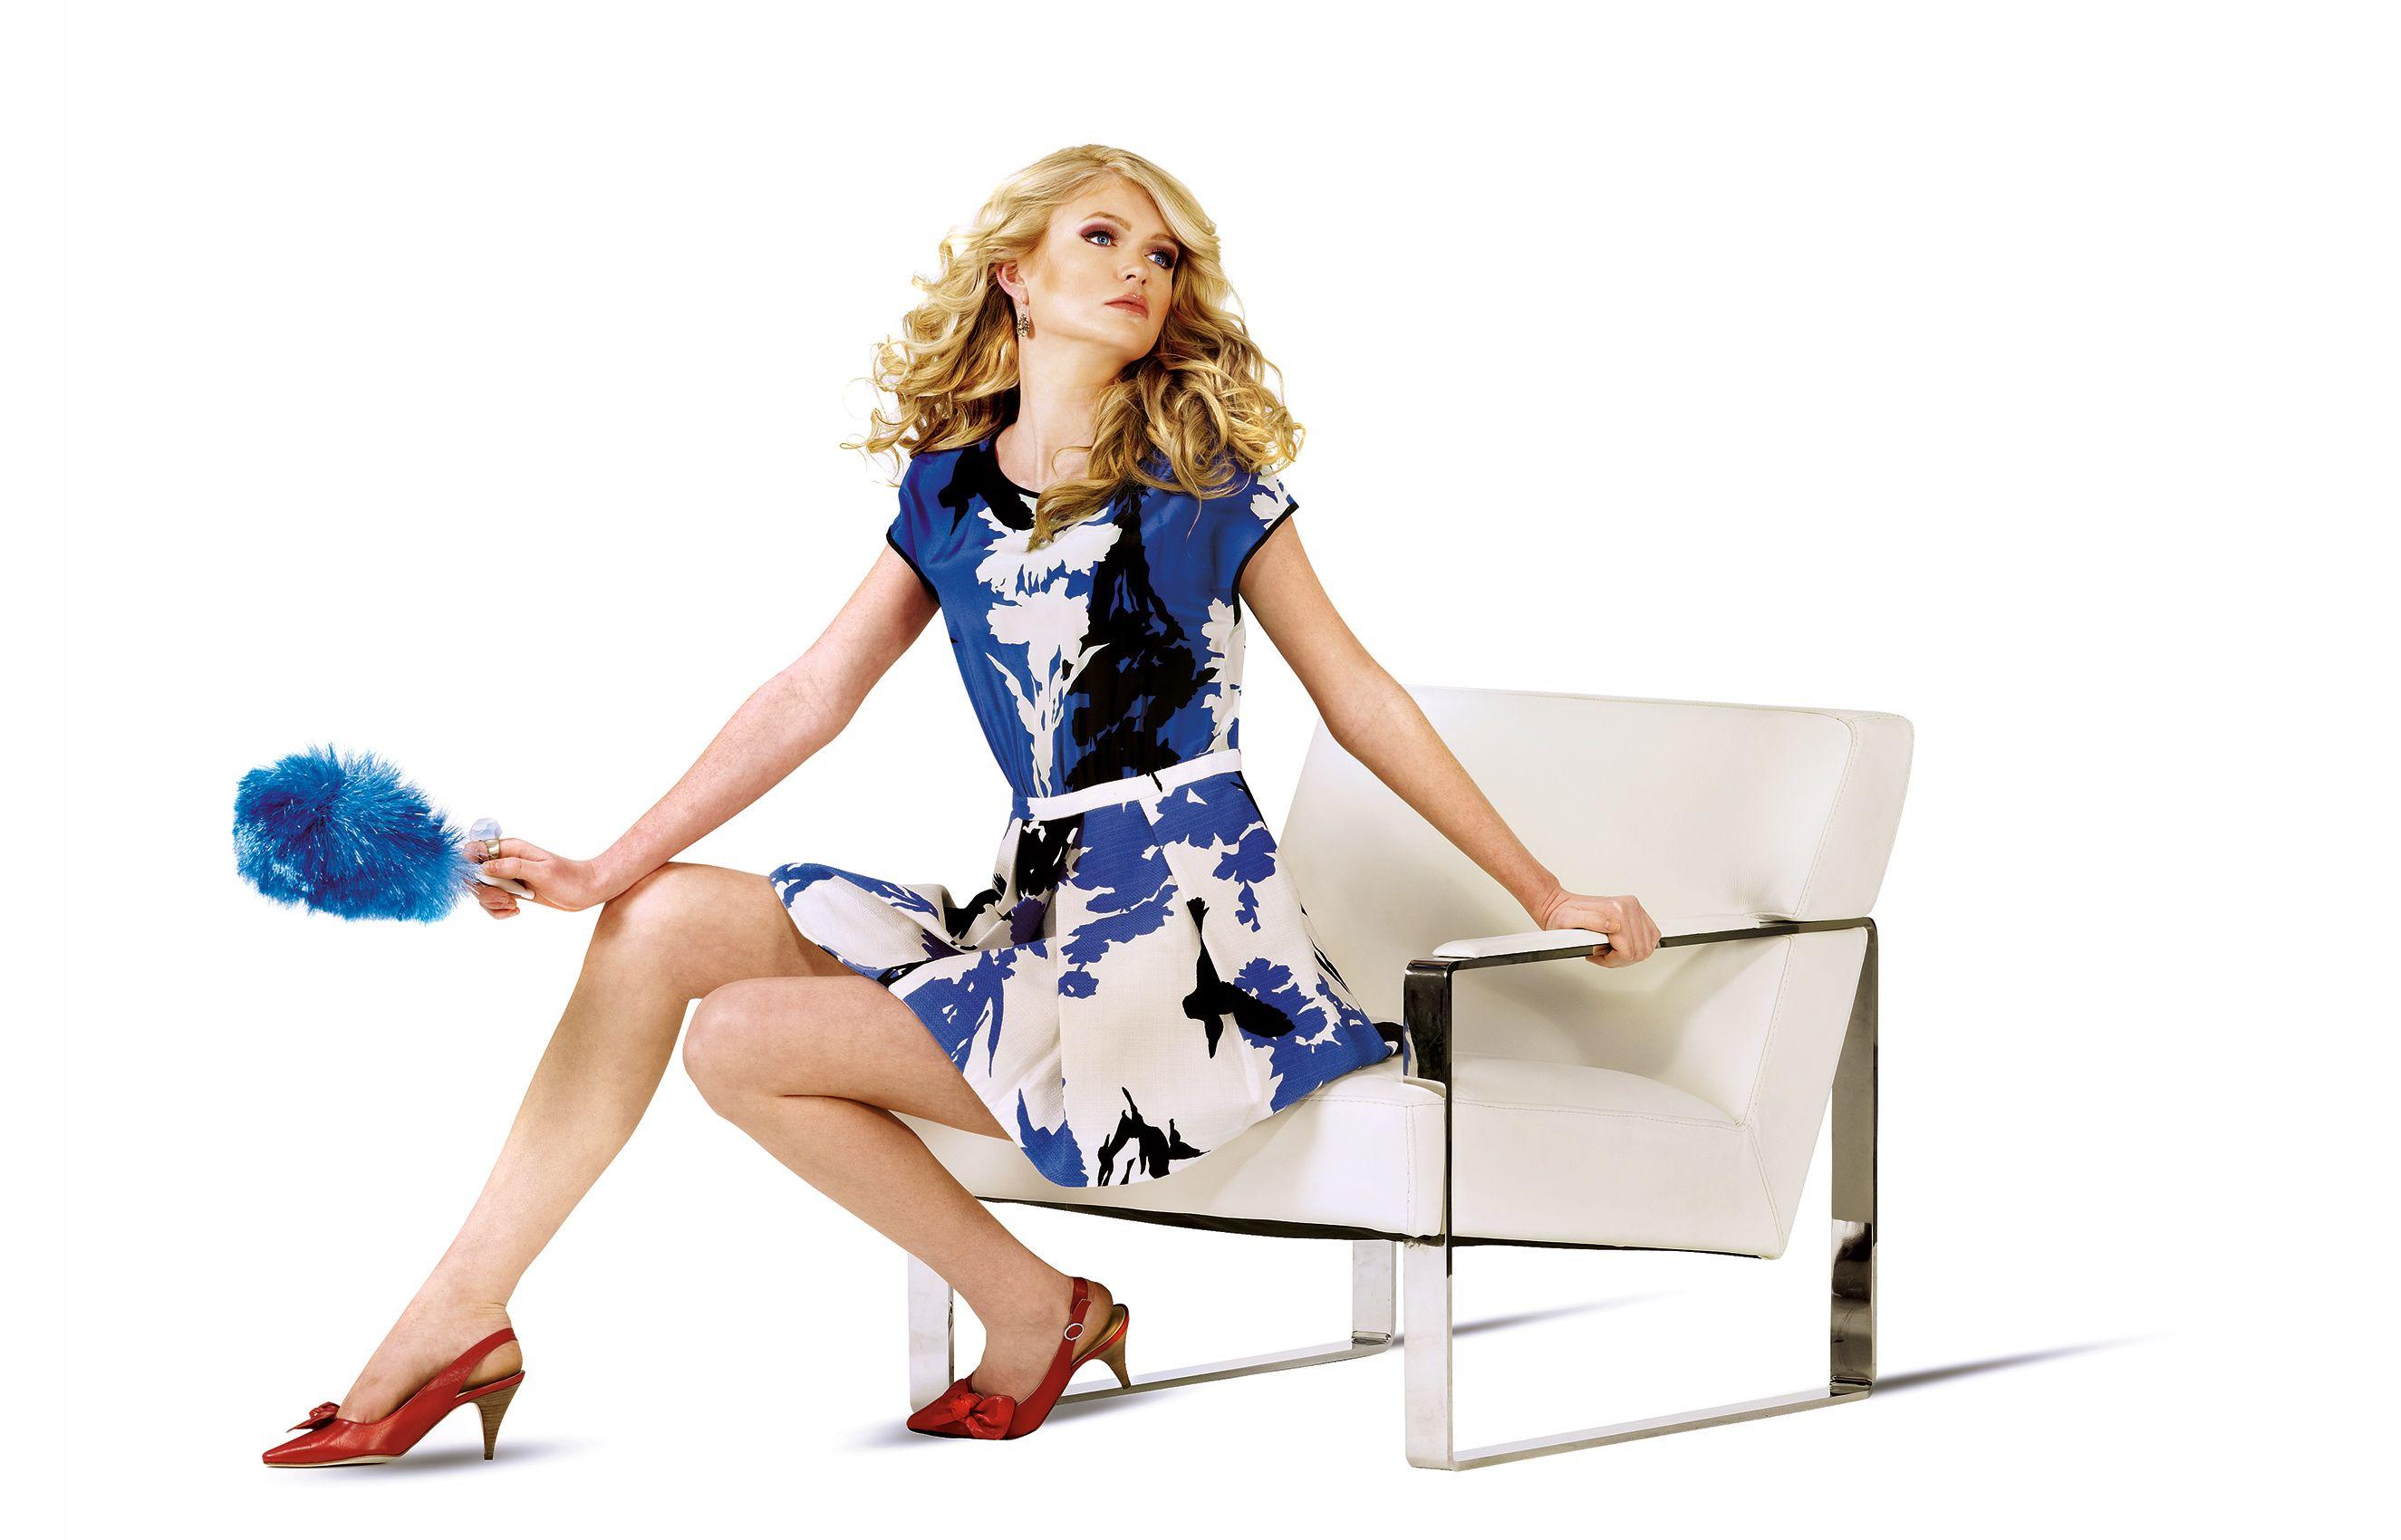 Blue_White-Dress-on-White-Chair.jpg